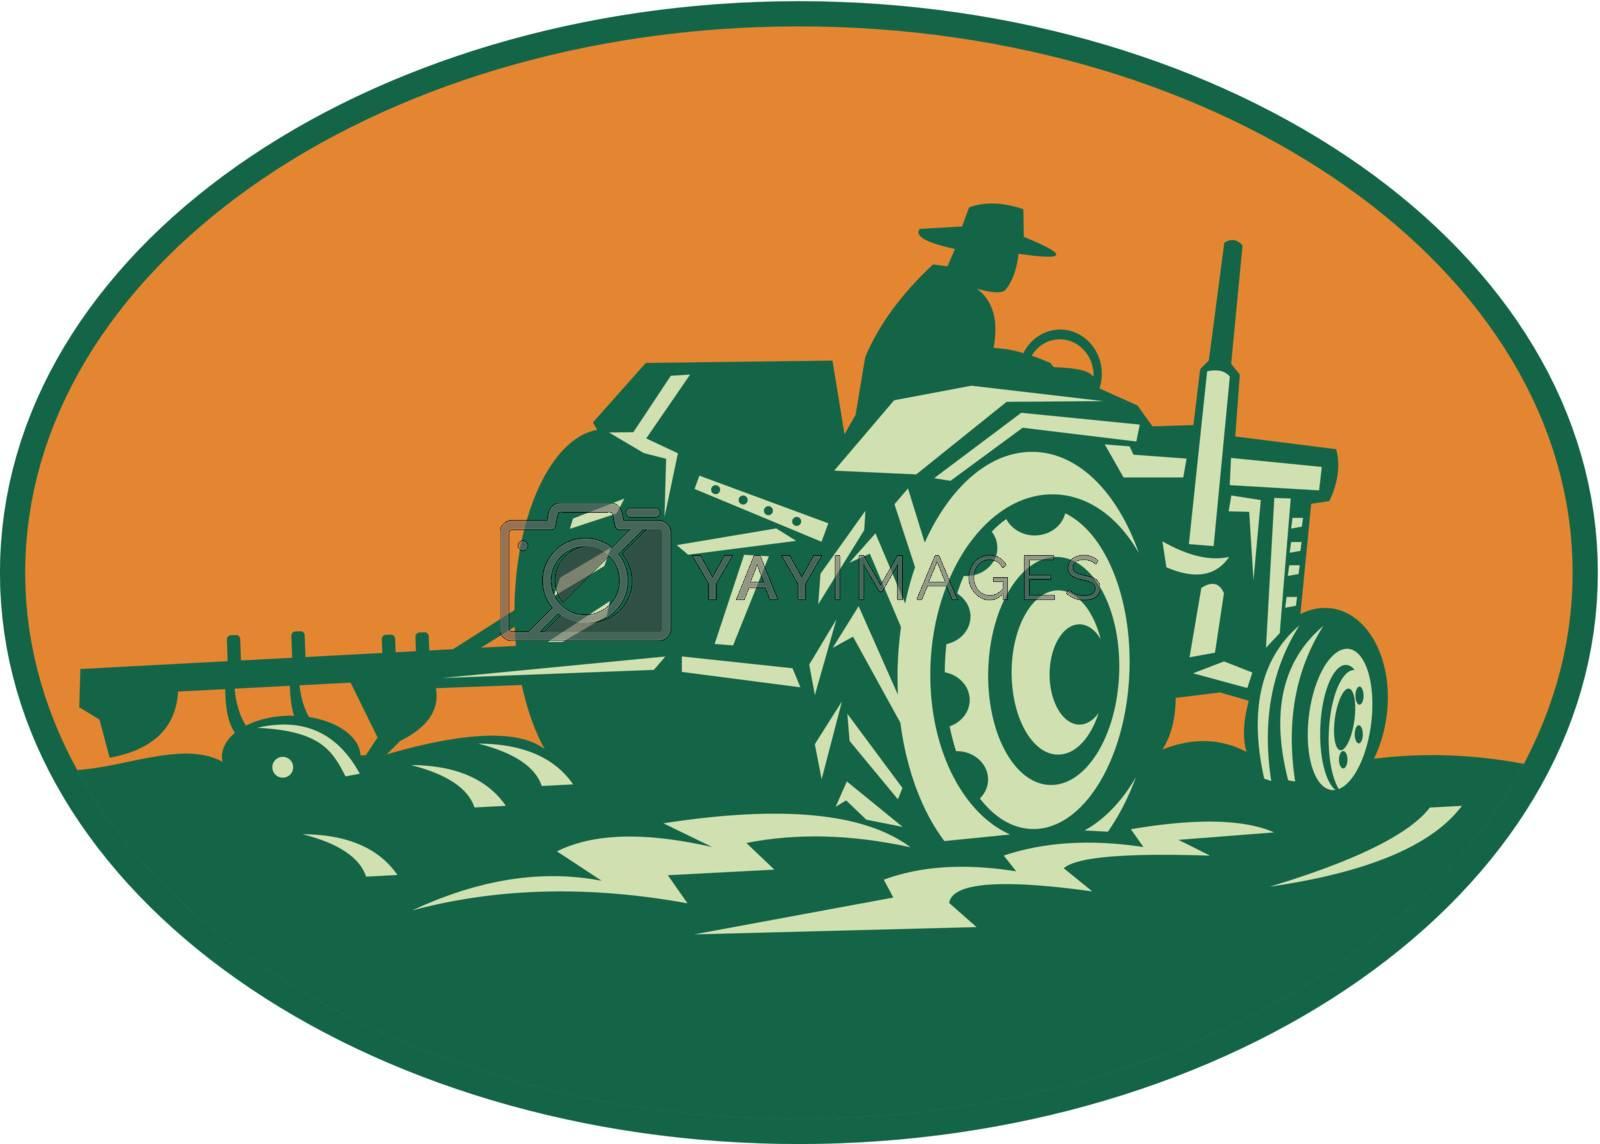 Retro illustration of a farmer worker driving a vintage farm tractor plowing field set inside ellipse.